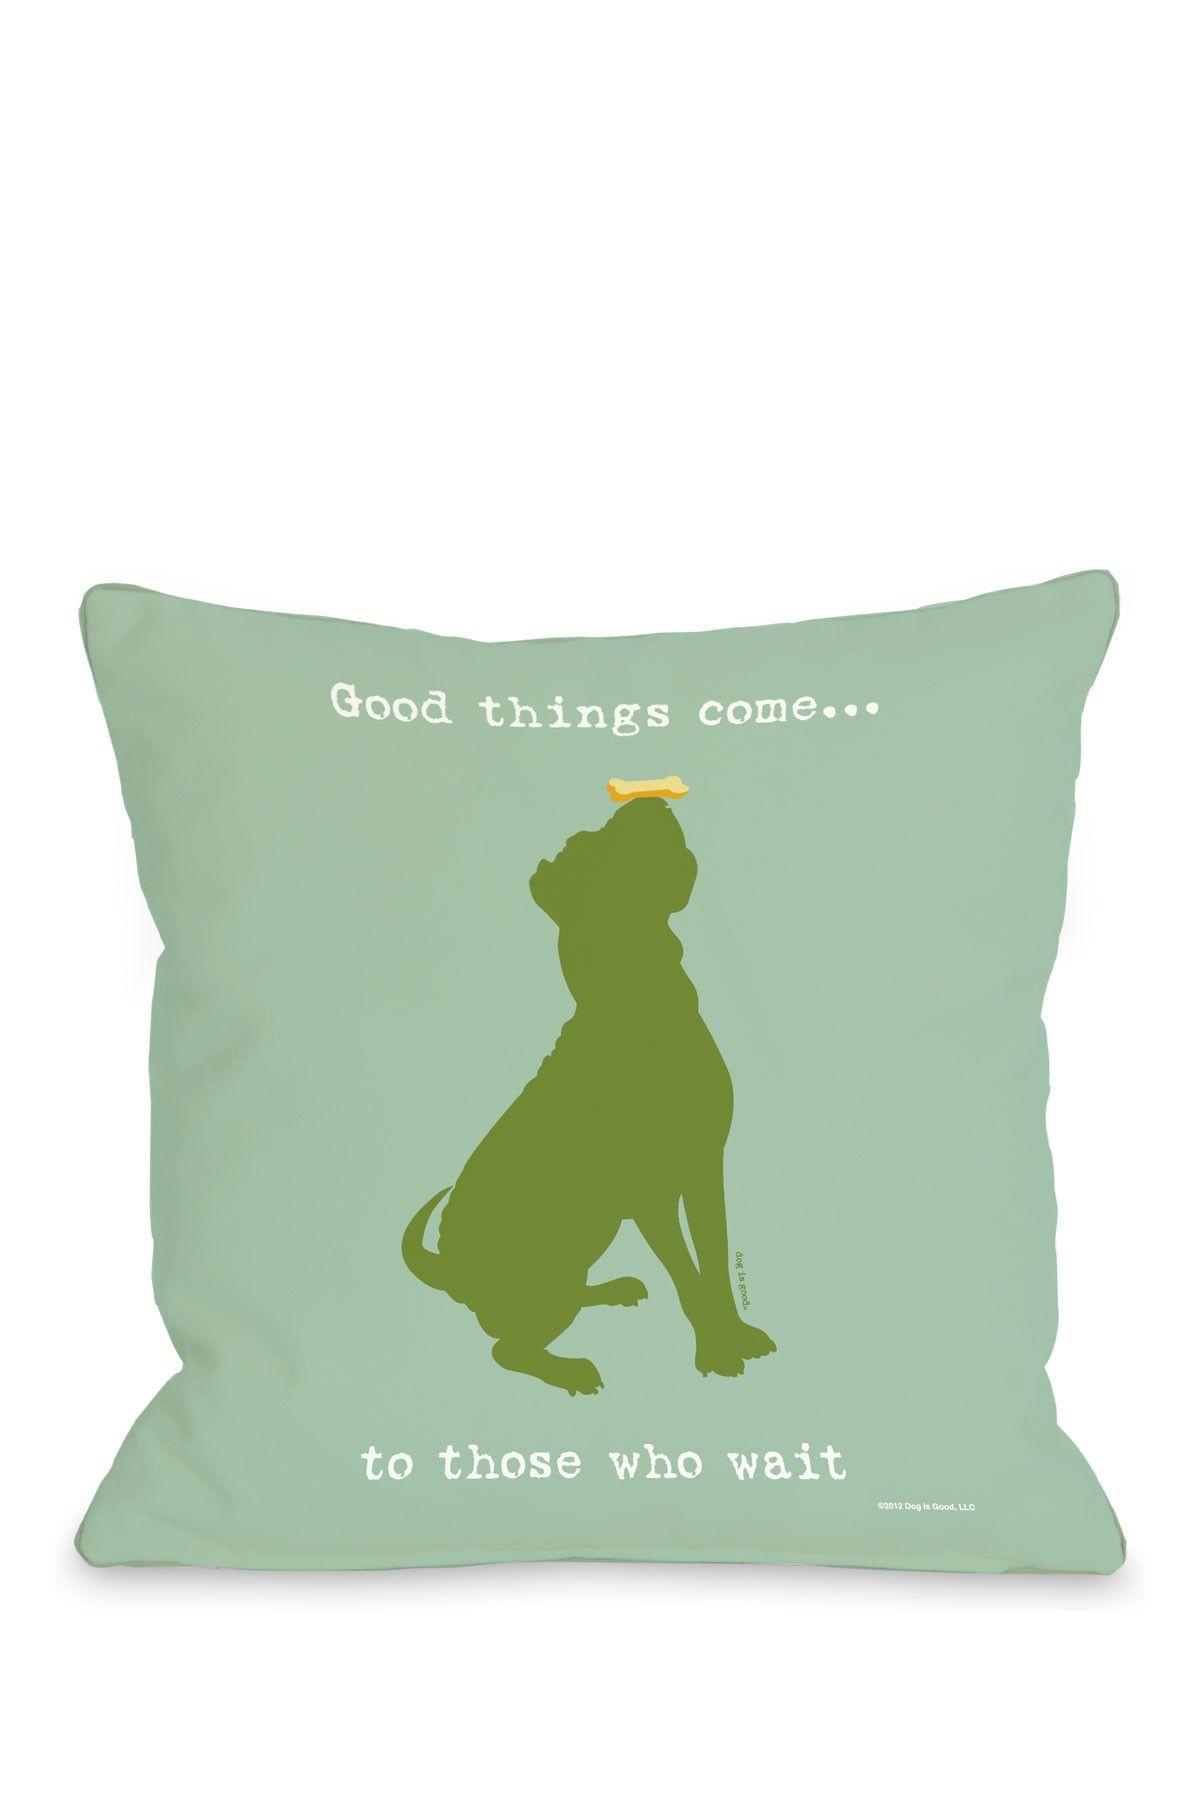 For Roo's pet corner